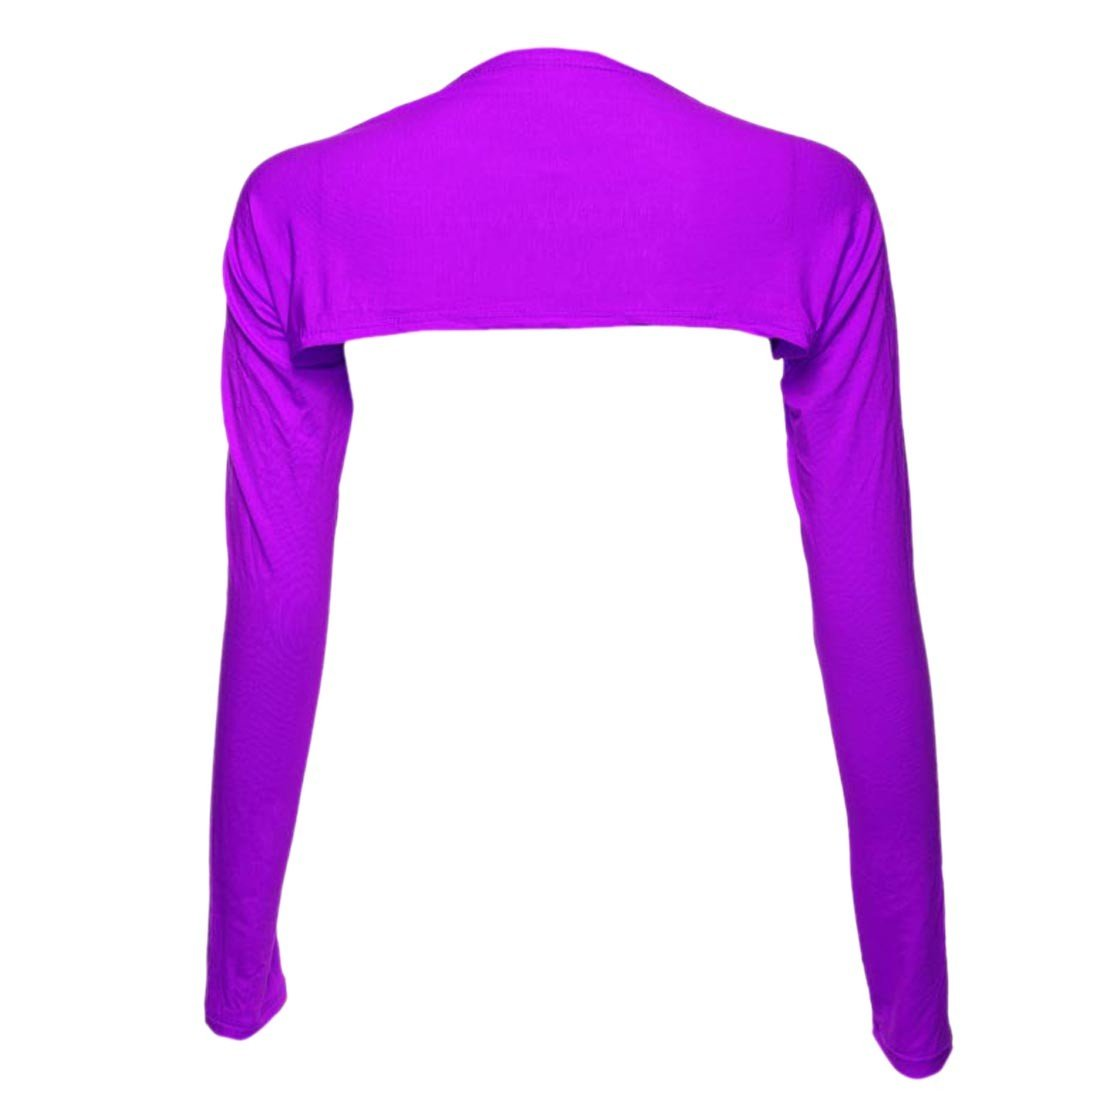 Paixpays Womens Long Sleeve Bolero Shrug Muslim Arm Cover One Piece Shawl E9099S0246